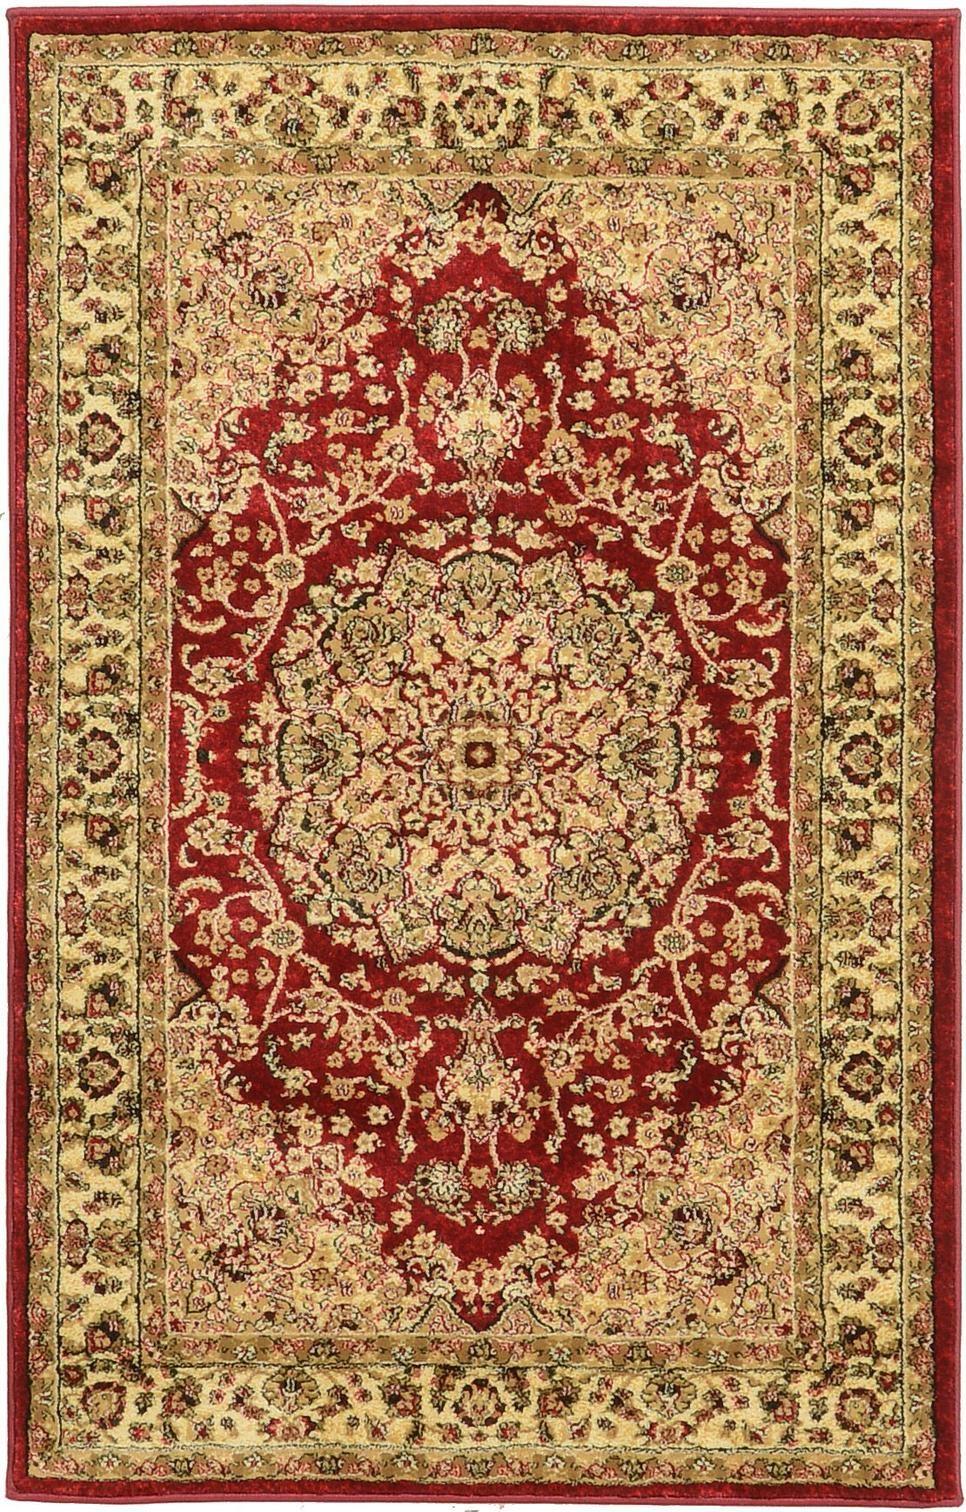 Persian Traditional Rugs New Carpets Unique Carpet Designs